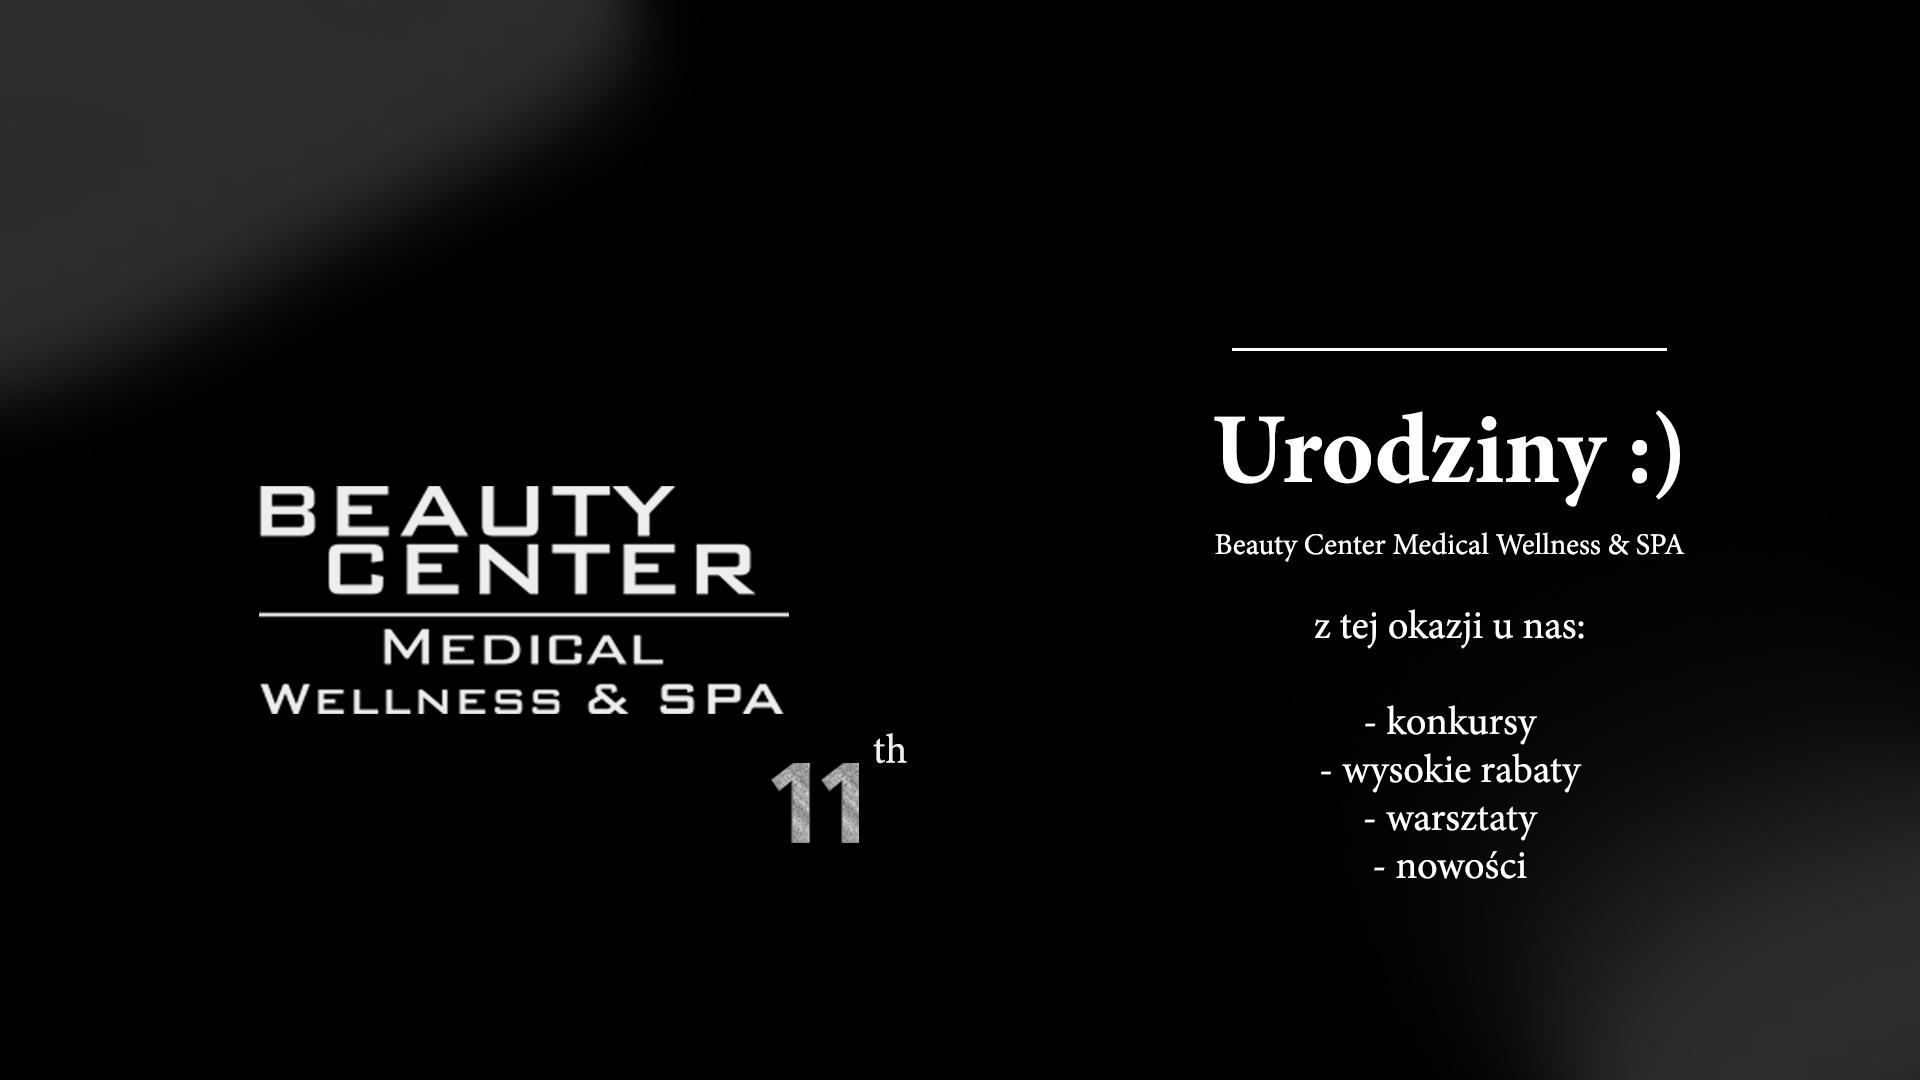 11-urodziny-Beauty-Center-Medical-Wellness-SPA